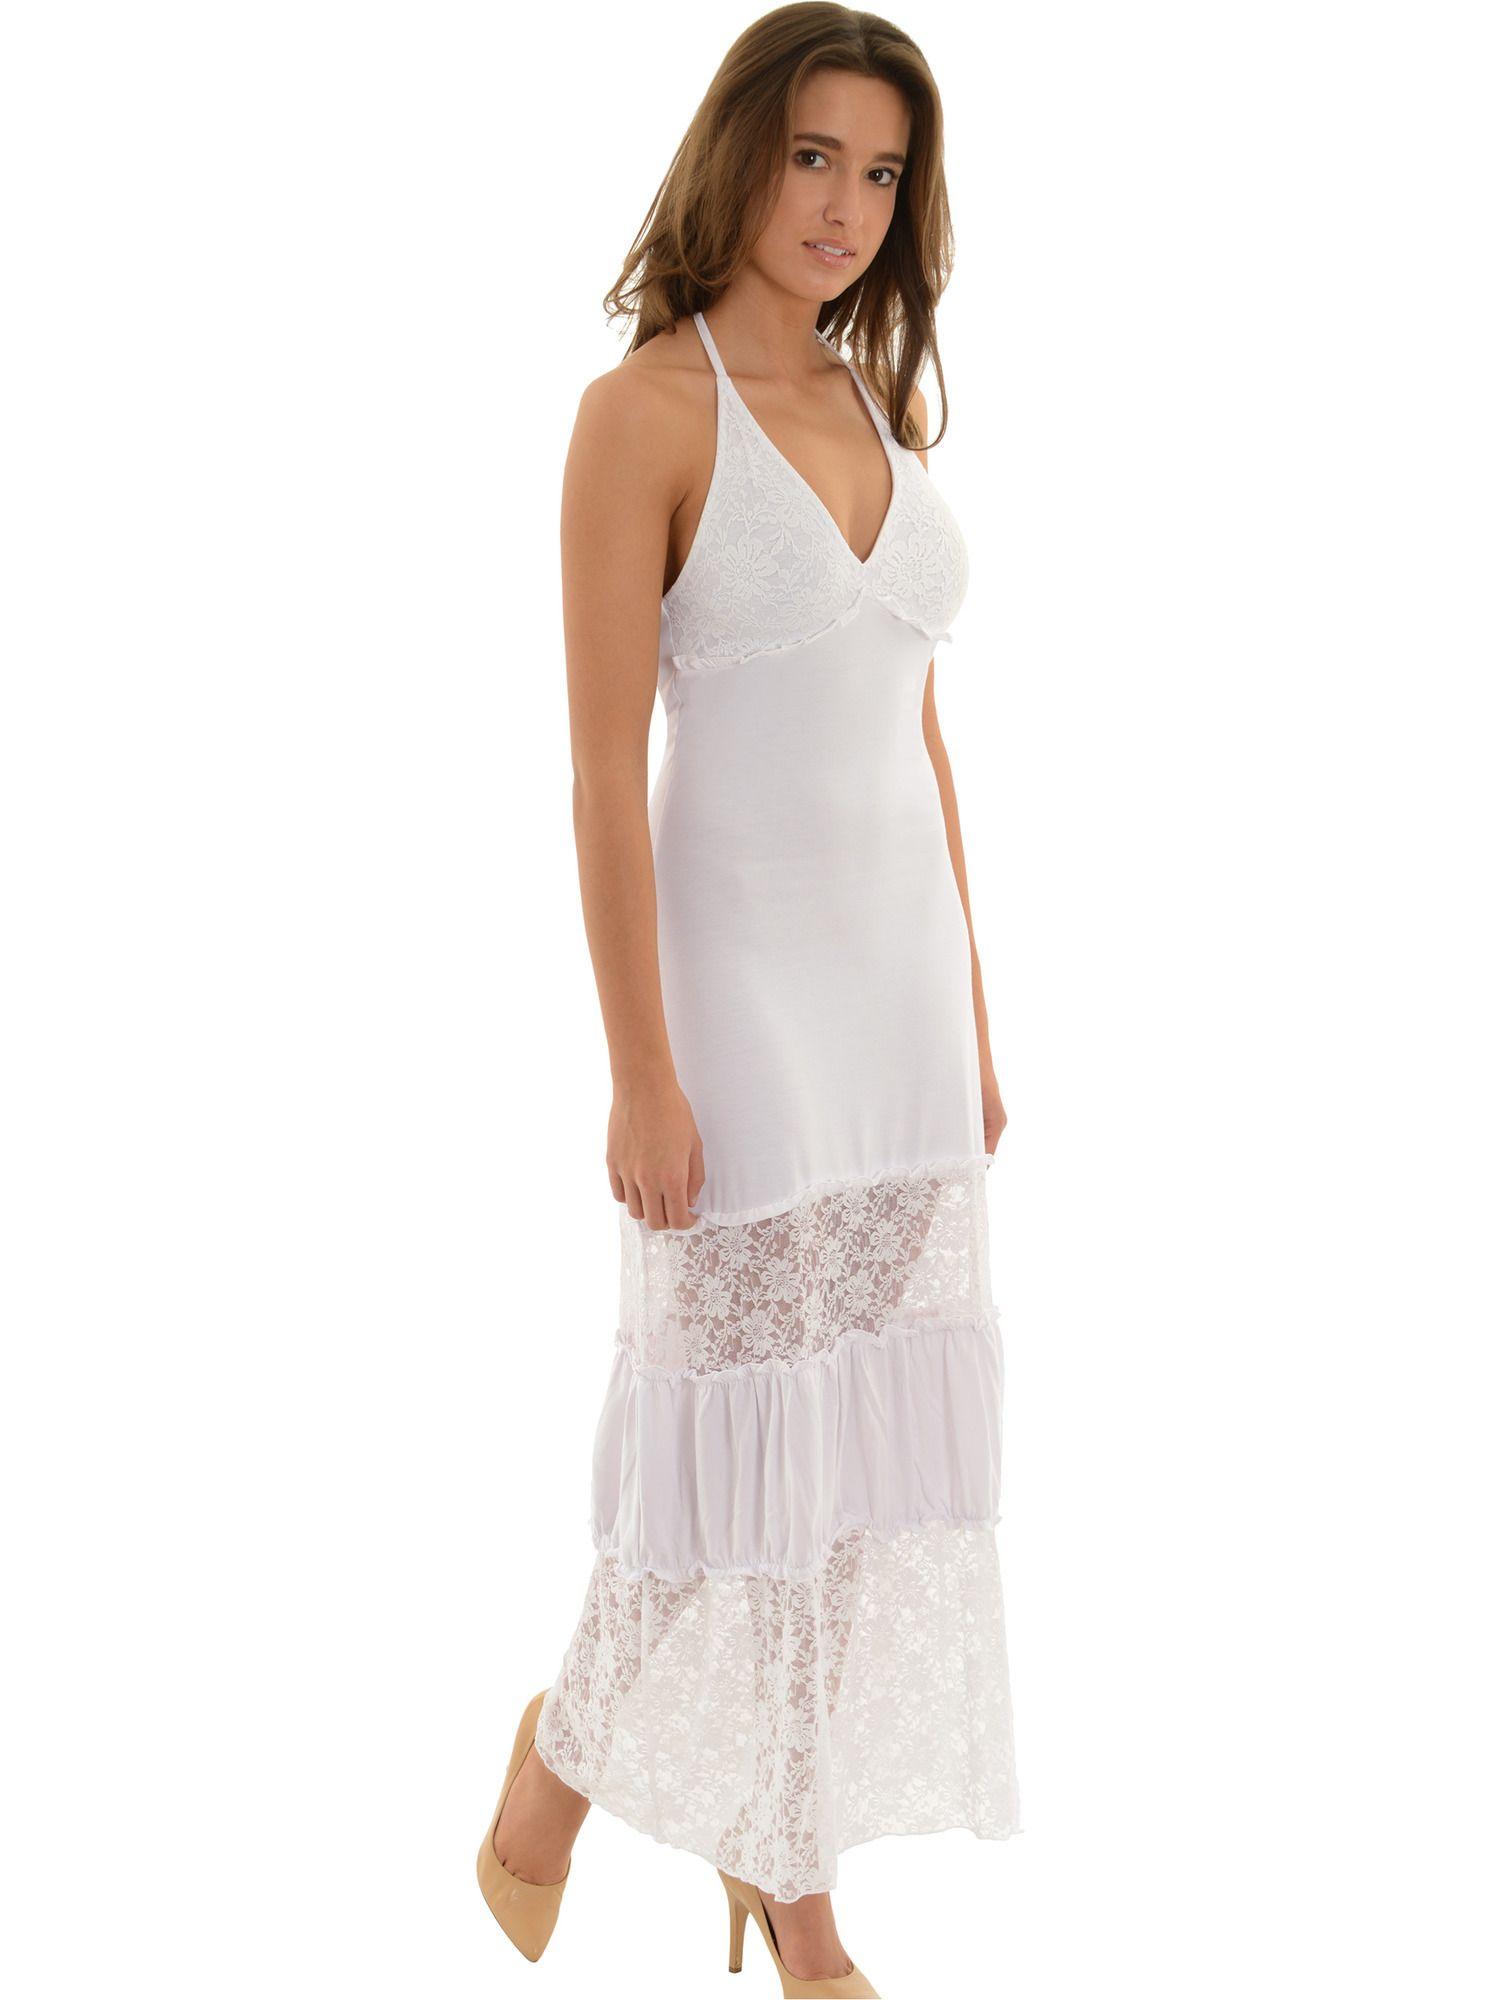 Zucan Womens White Maxi Dress Lace And Ruffle Detail Little White Dresses Walmart Com Womens White Maxi Dresses White Maxi Dresses White Lace Maxi Dress [ 2000 x 1500 Pixel ]